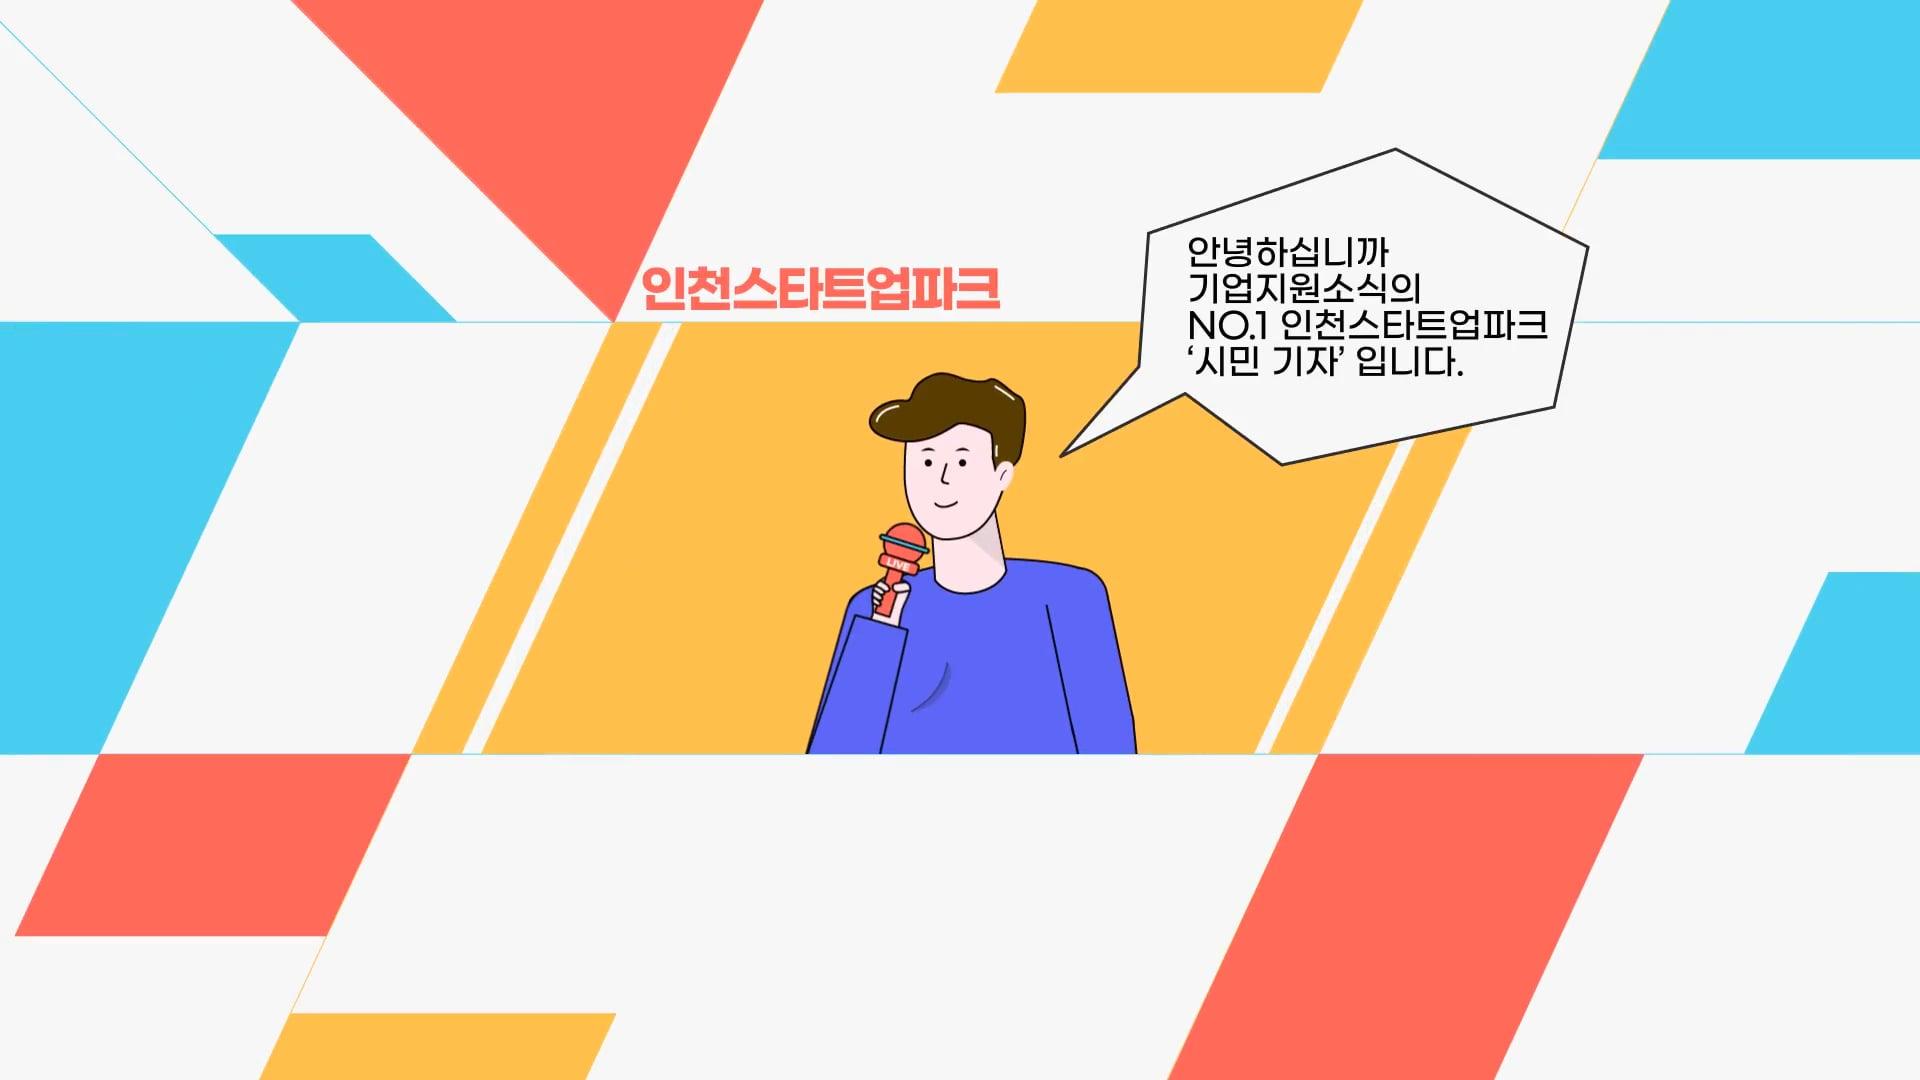 [MOTION] 인천테크노파크 모션그래픽